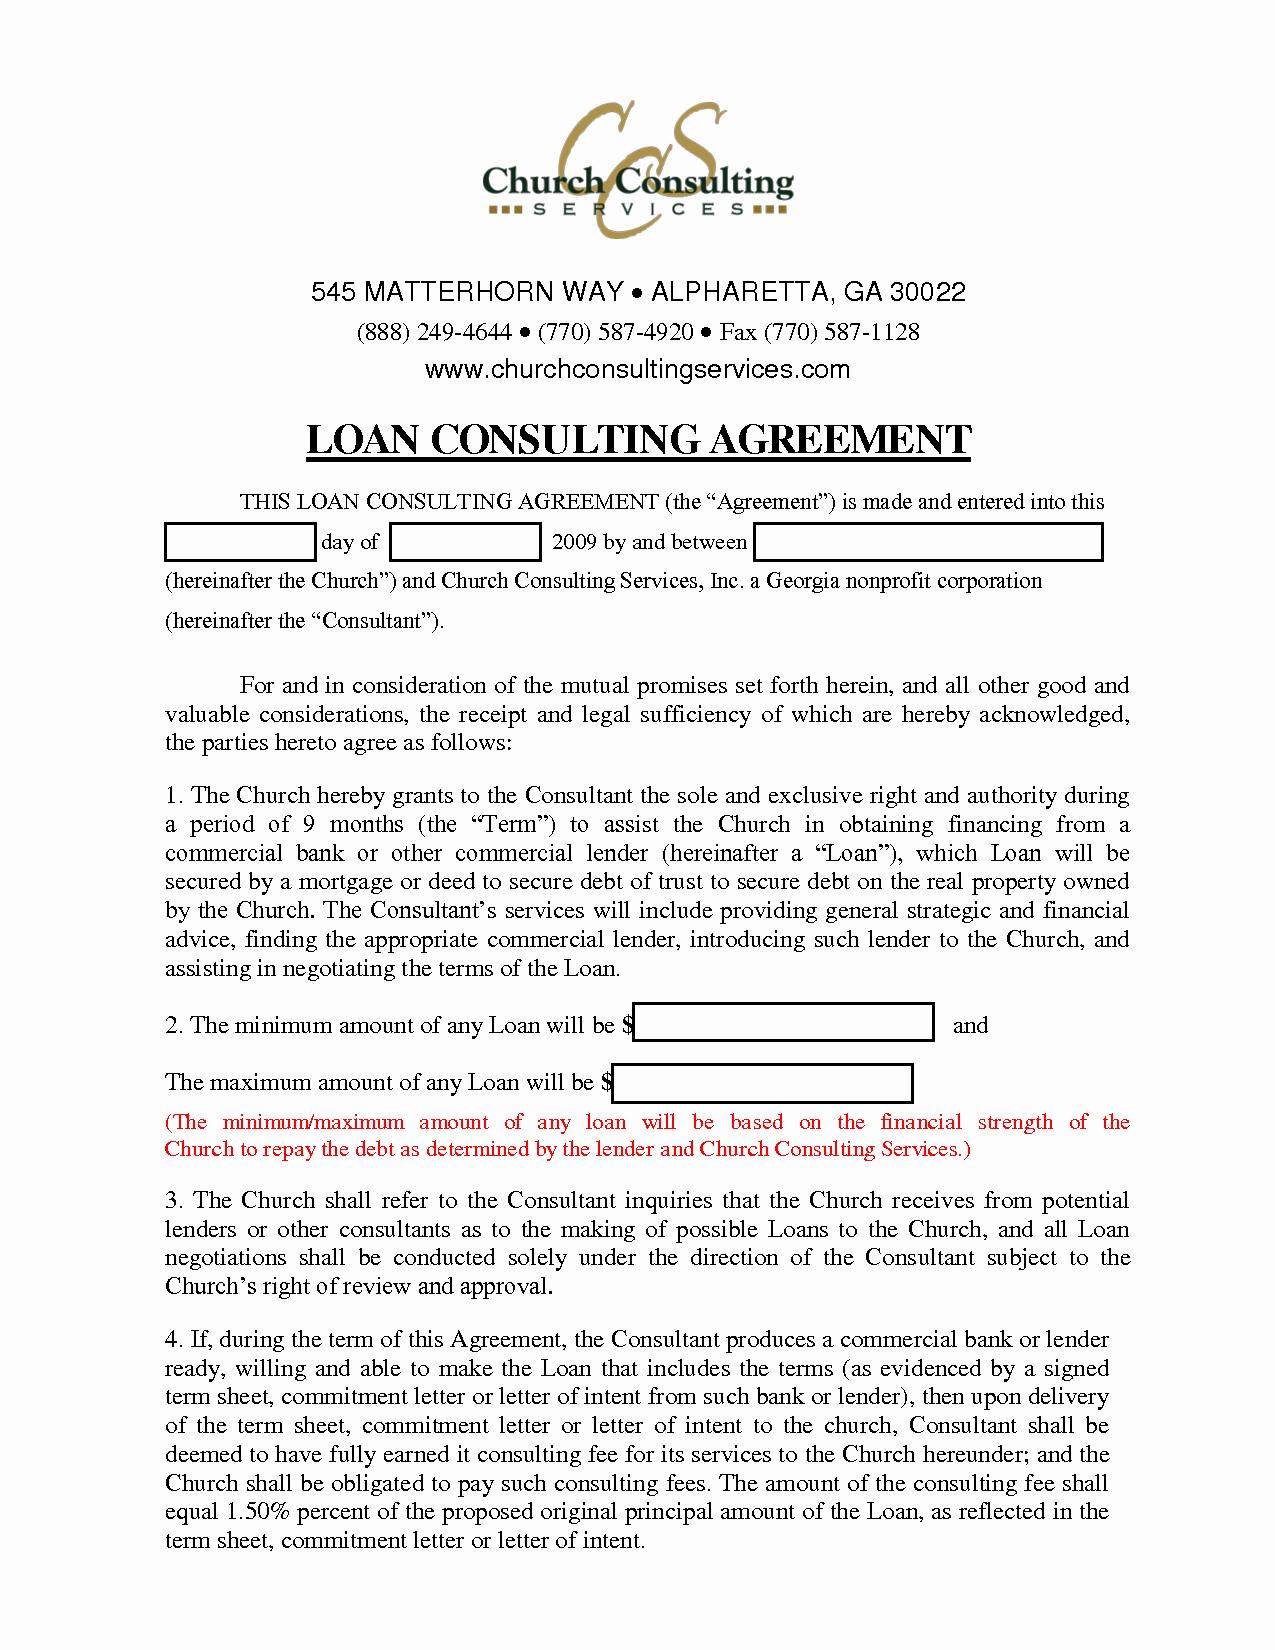 Bank Loan Proposal Template – Doggiedesigneu Throughout Business Proposal For Bank Loan Template